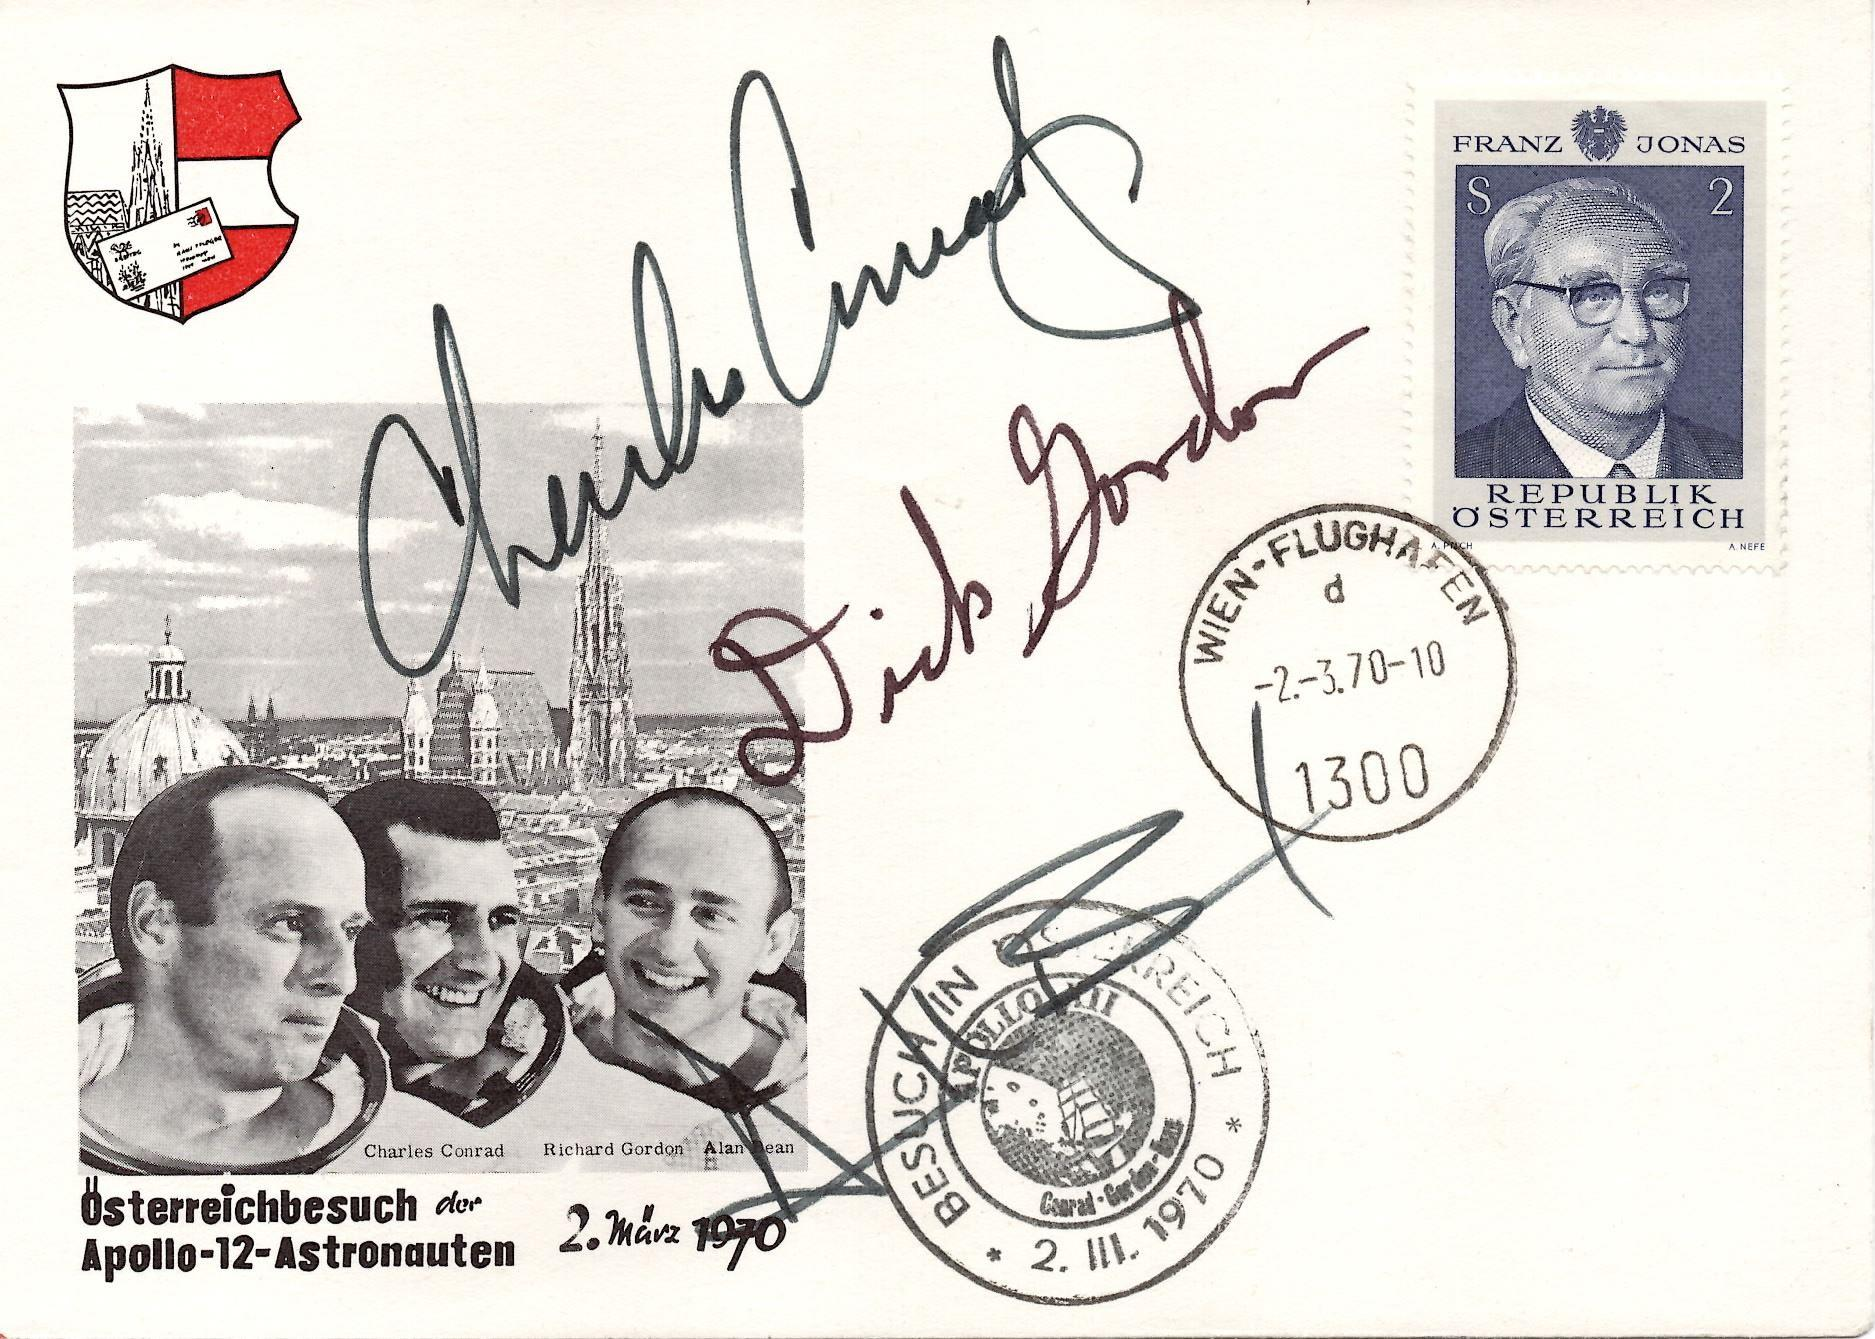 Apollo 12 Crew Signed Austrian FDC, Conrad, Gordon, and Bean